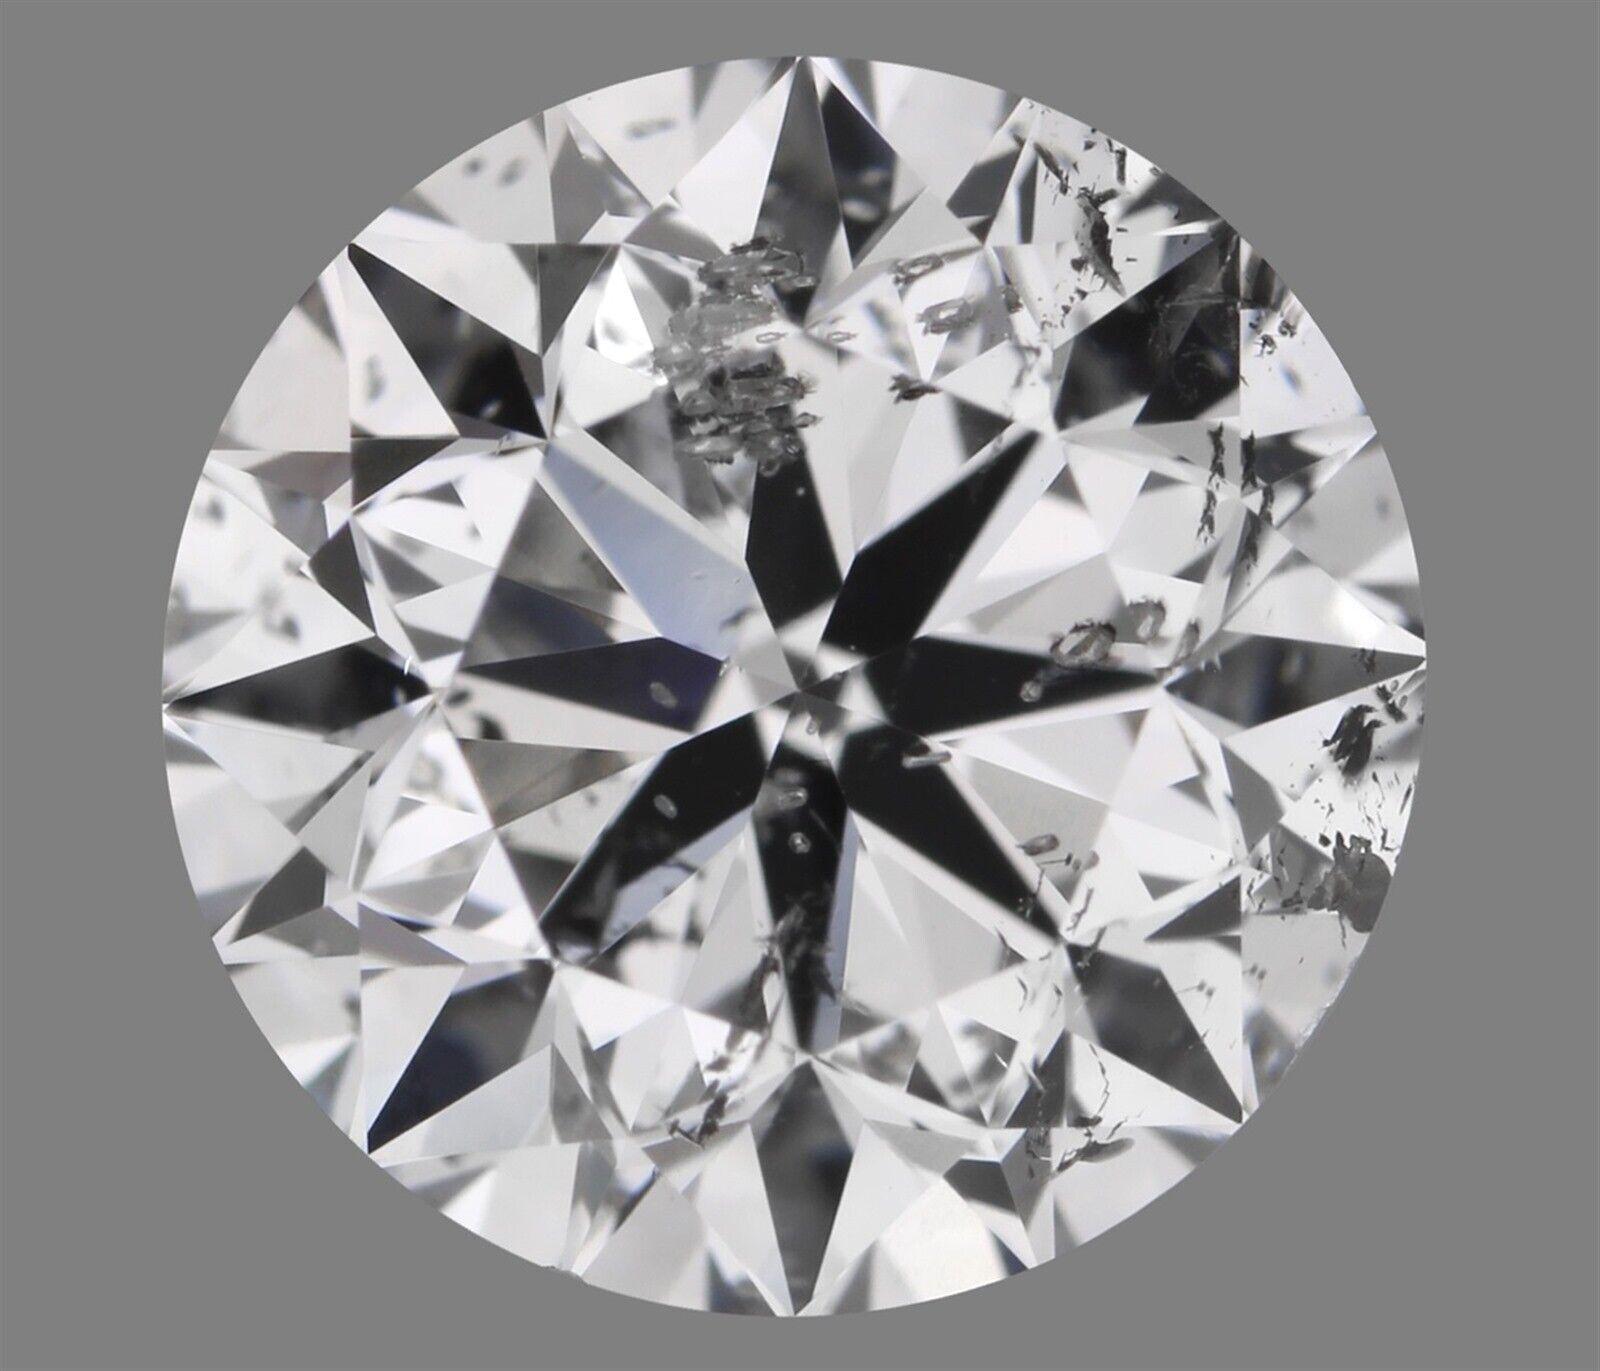 1.50 ct F Color I1 Clarity Round 100% Natural Loose Diamond VG Cut GIA FL Medium